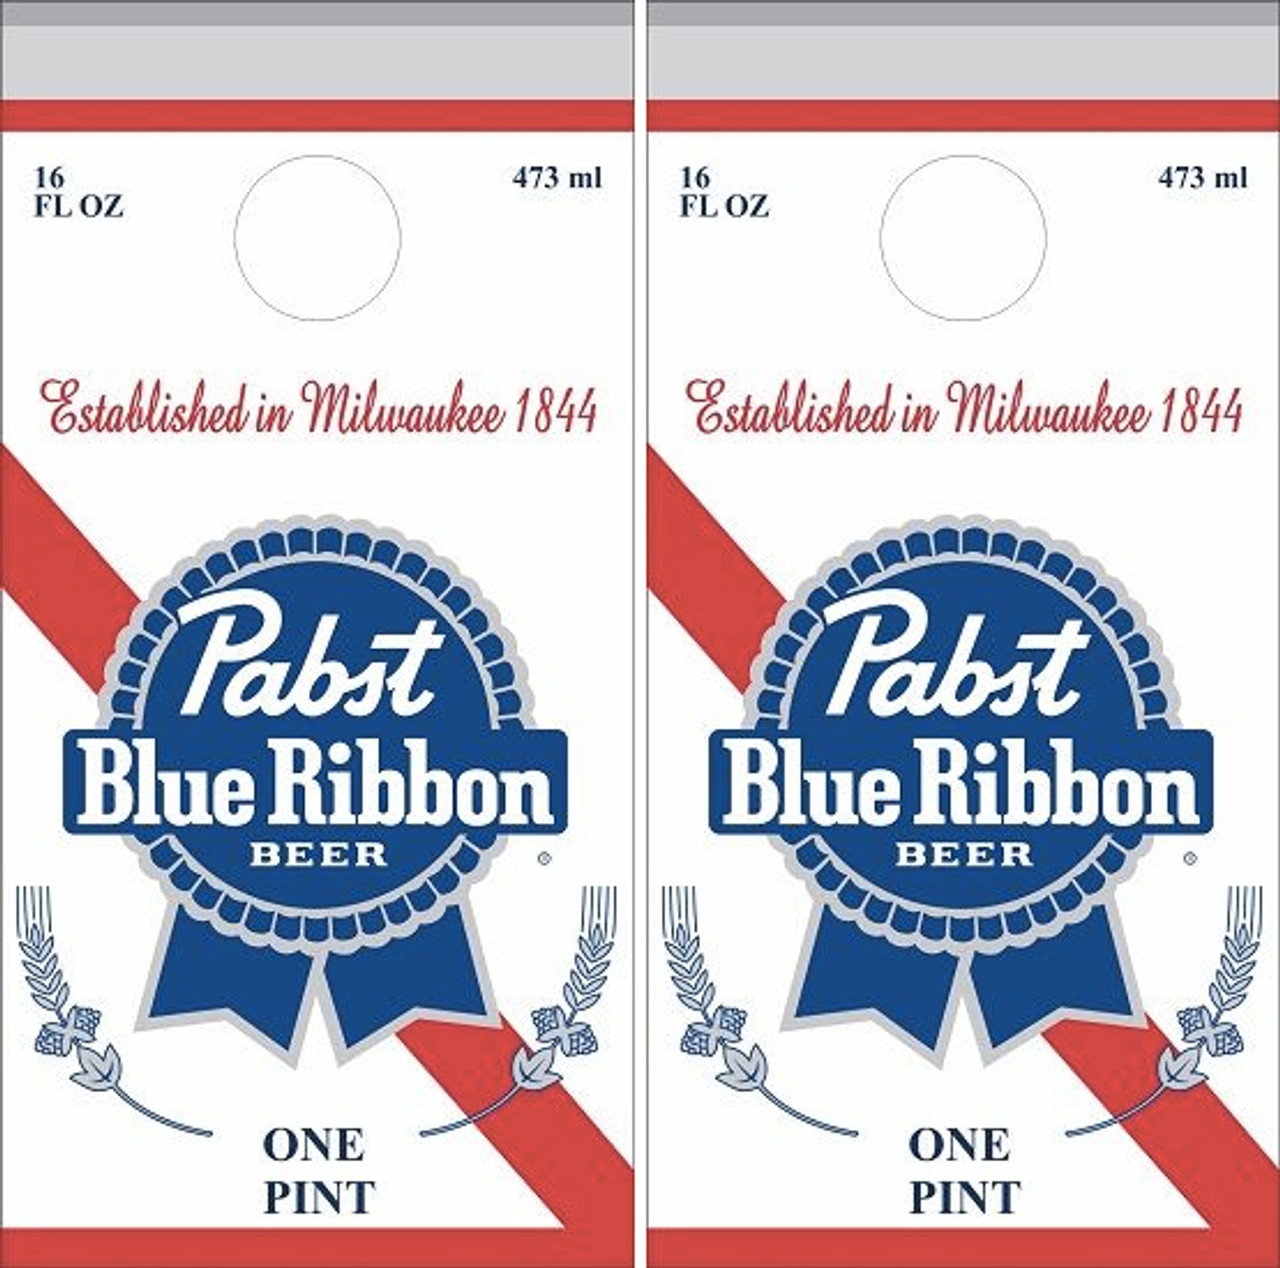 Pabst Blue Ribbon Grafitti Cornhole Skin Wrap Decal With Laminate